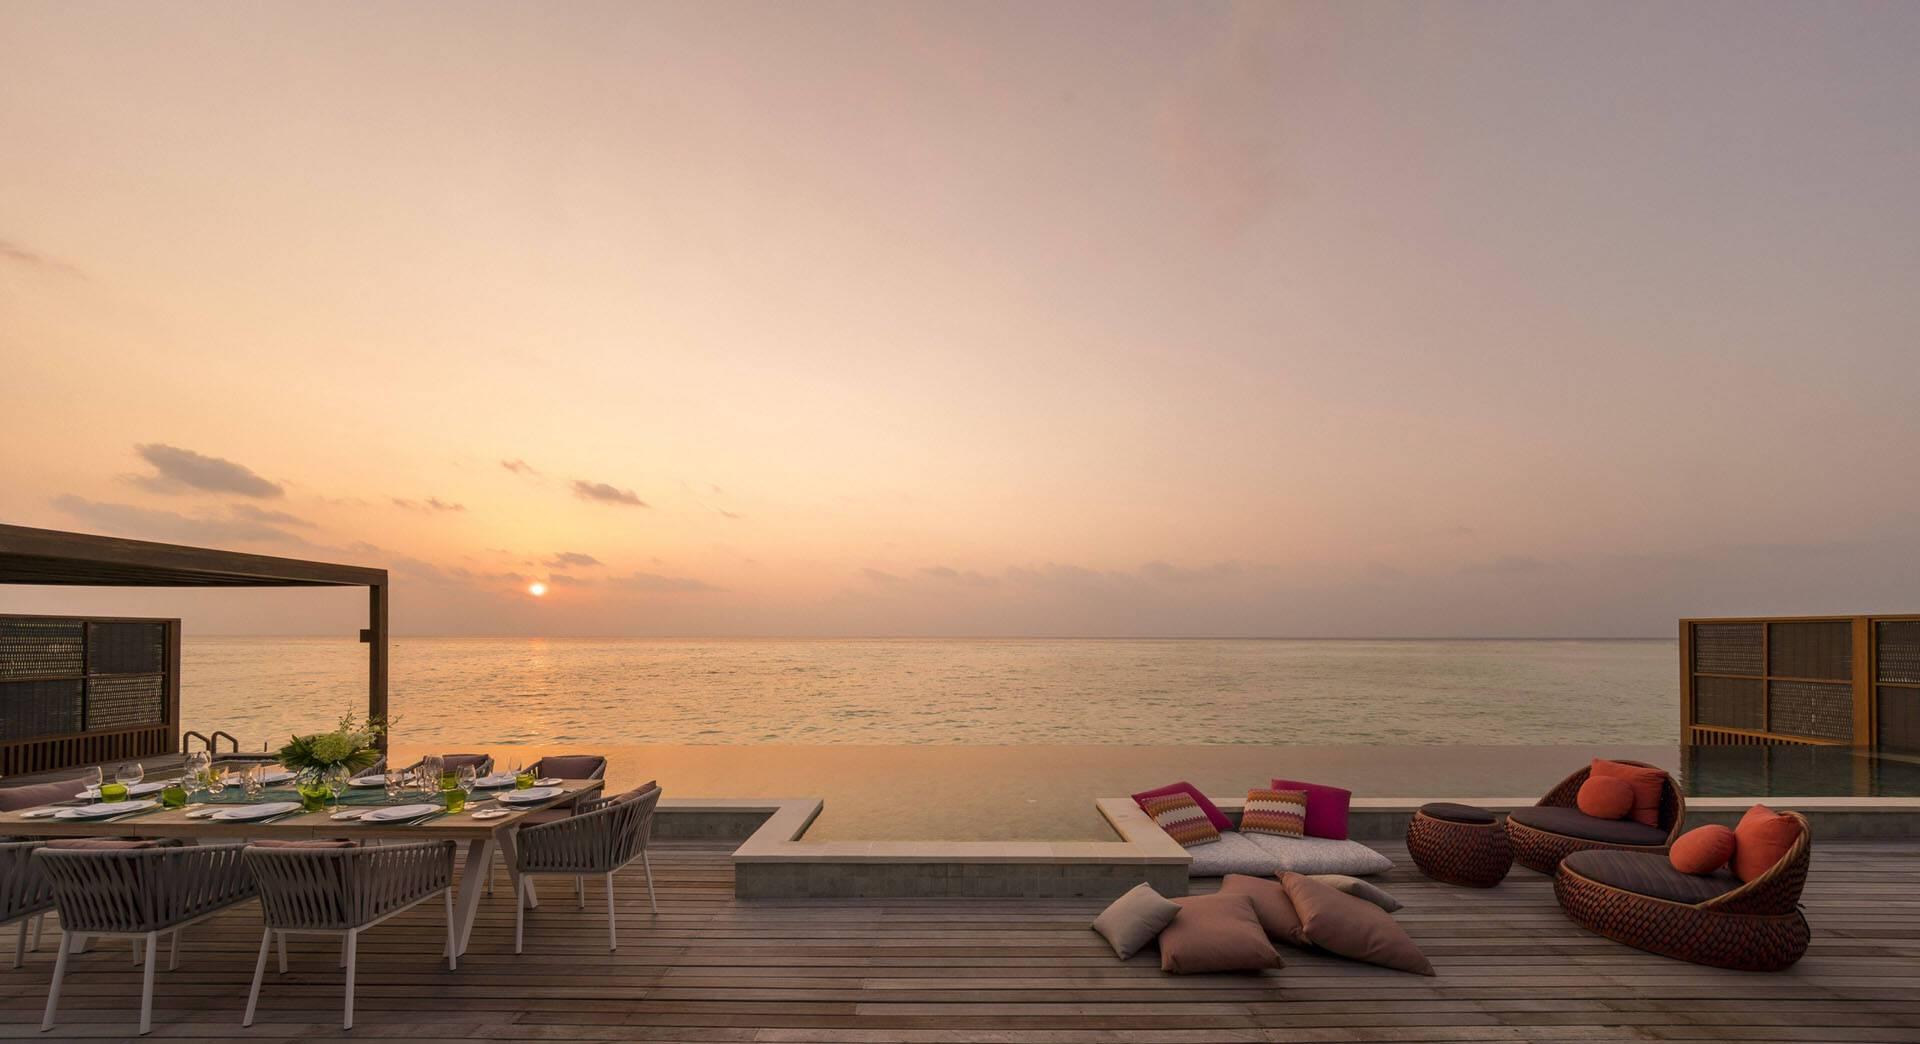 Four Seasons Kuda Huraa Maldives Hebergement Coucher Soleil